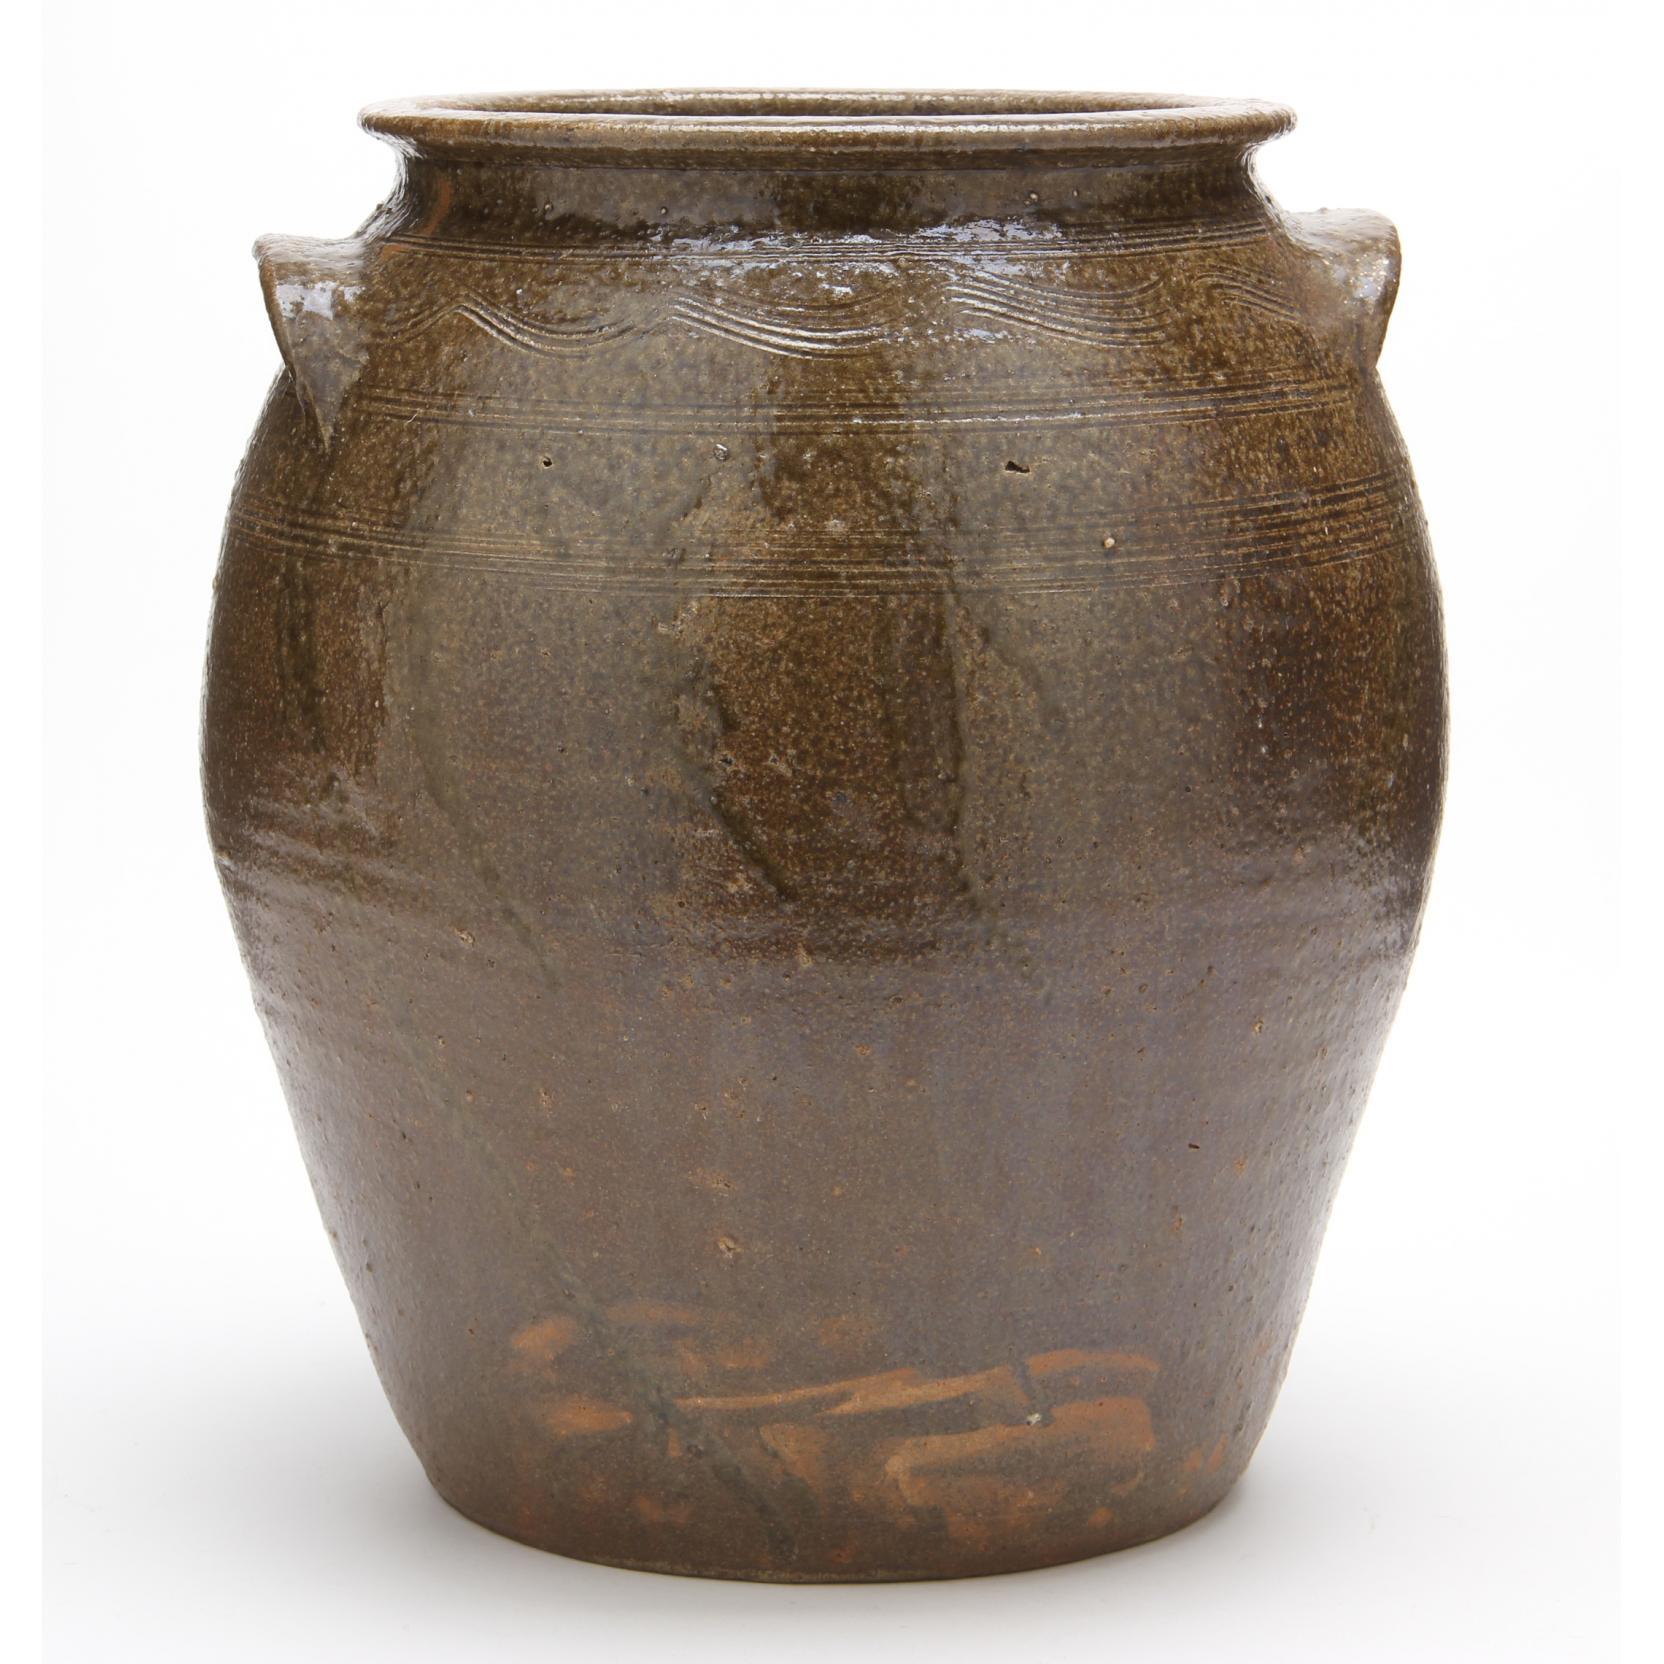 nc-pottery-three-gallon-storage-crock